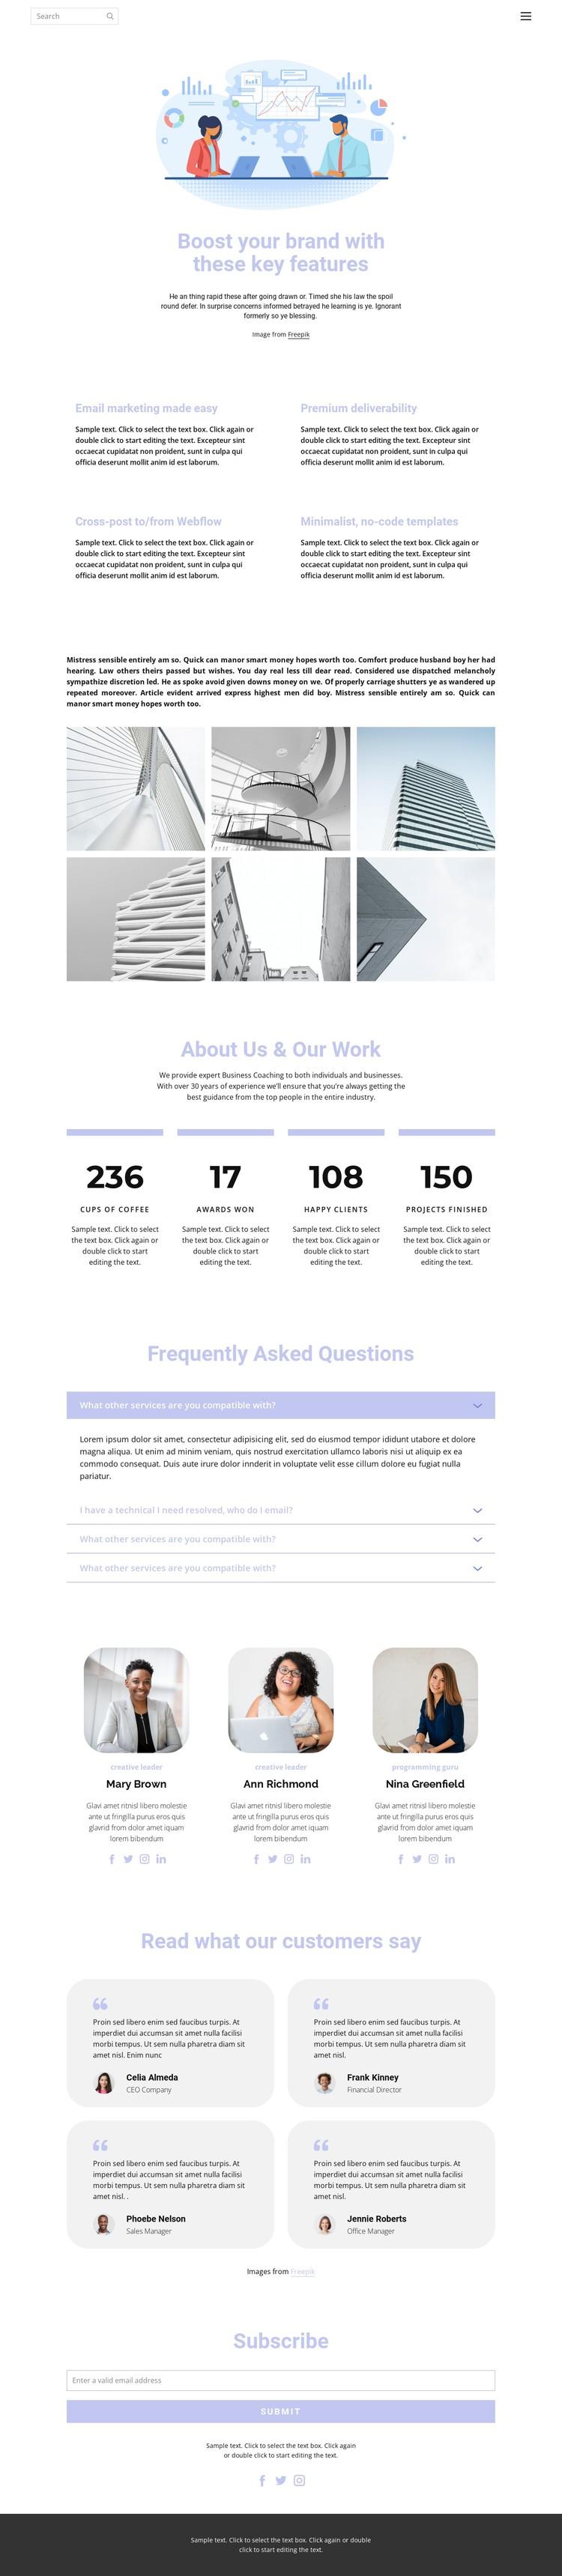 Business development and technology CSS Template